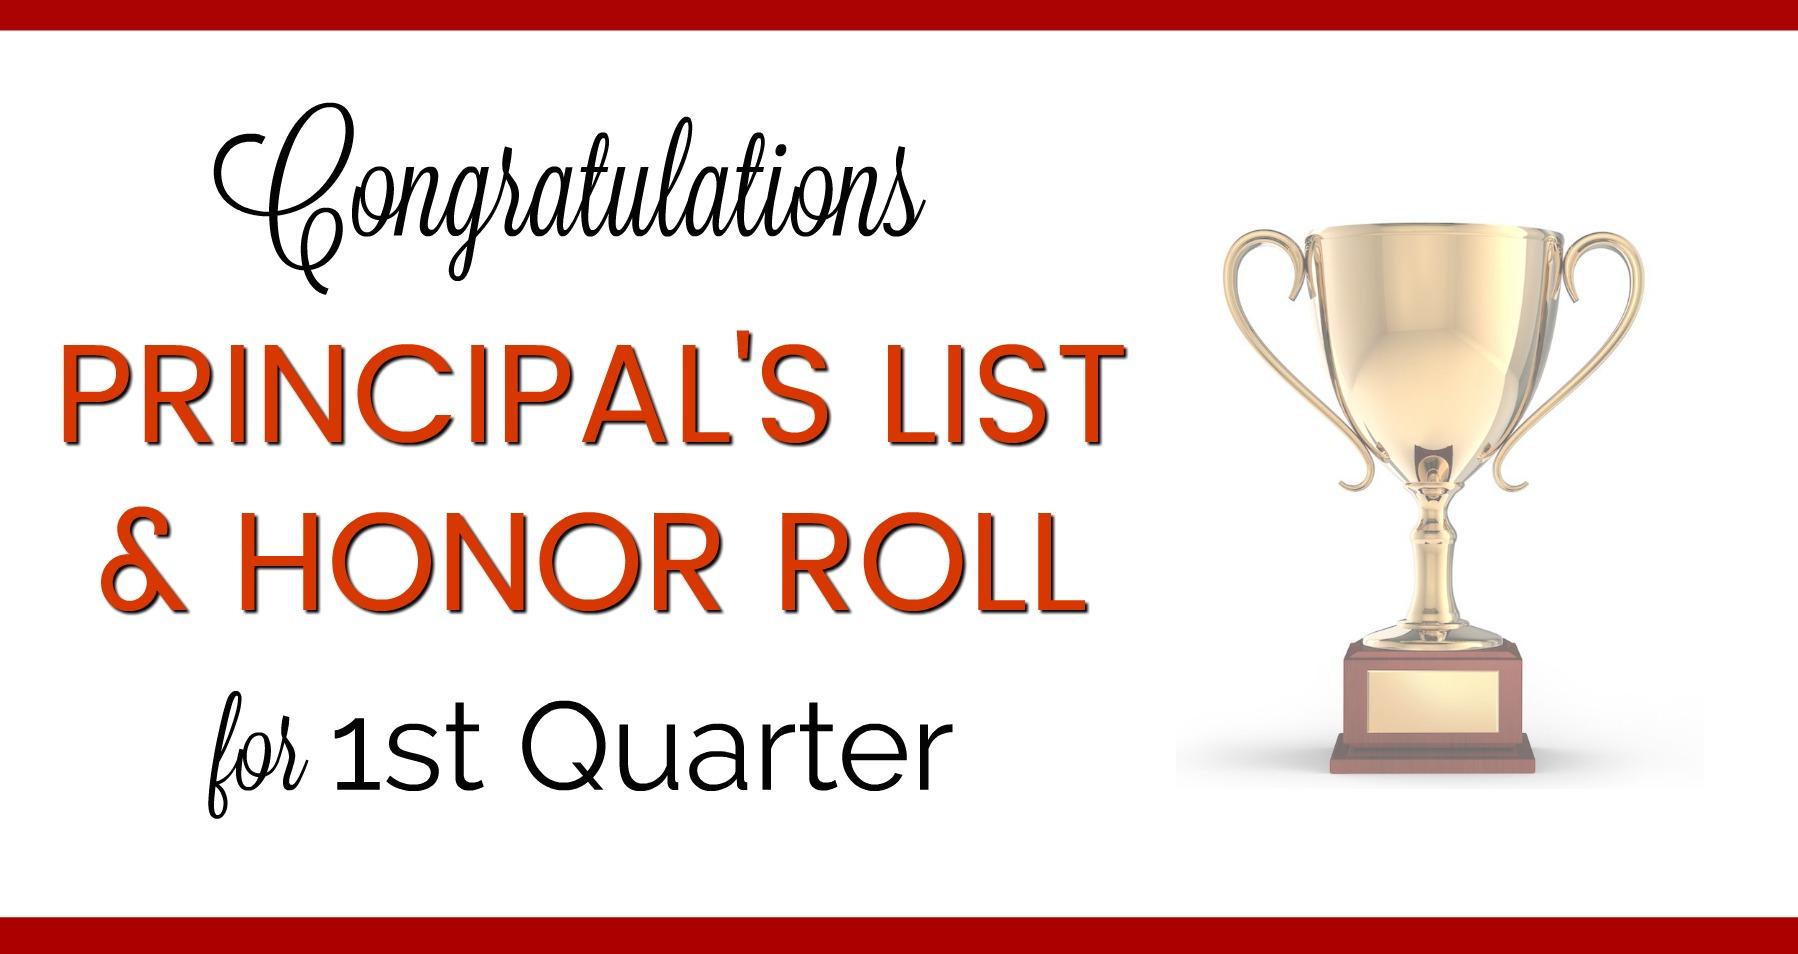 Principal's List & Honor Roll